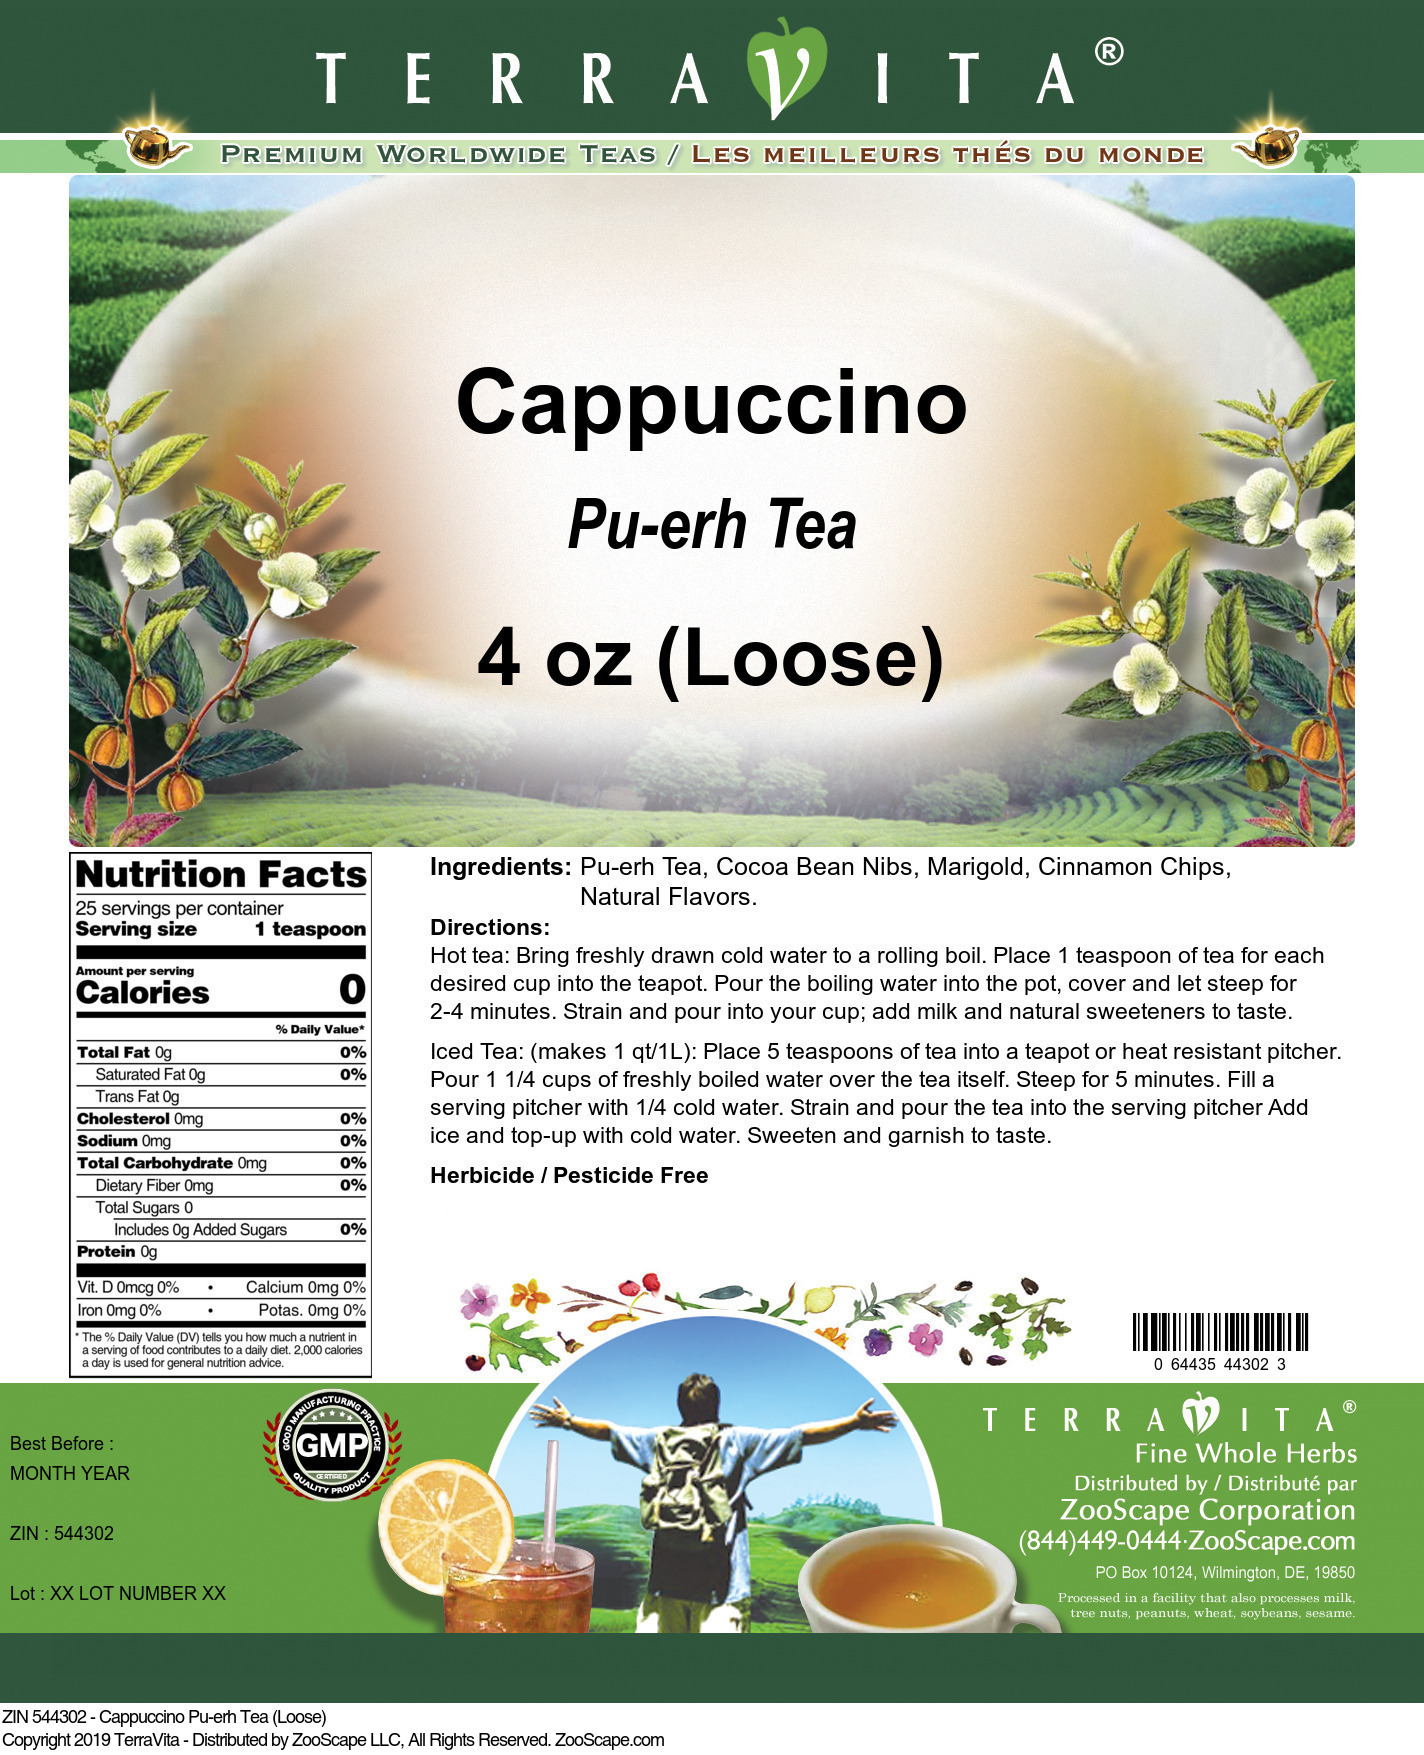 Cappuccino Pu-erh Tea (Loose)